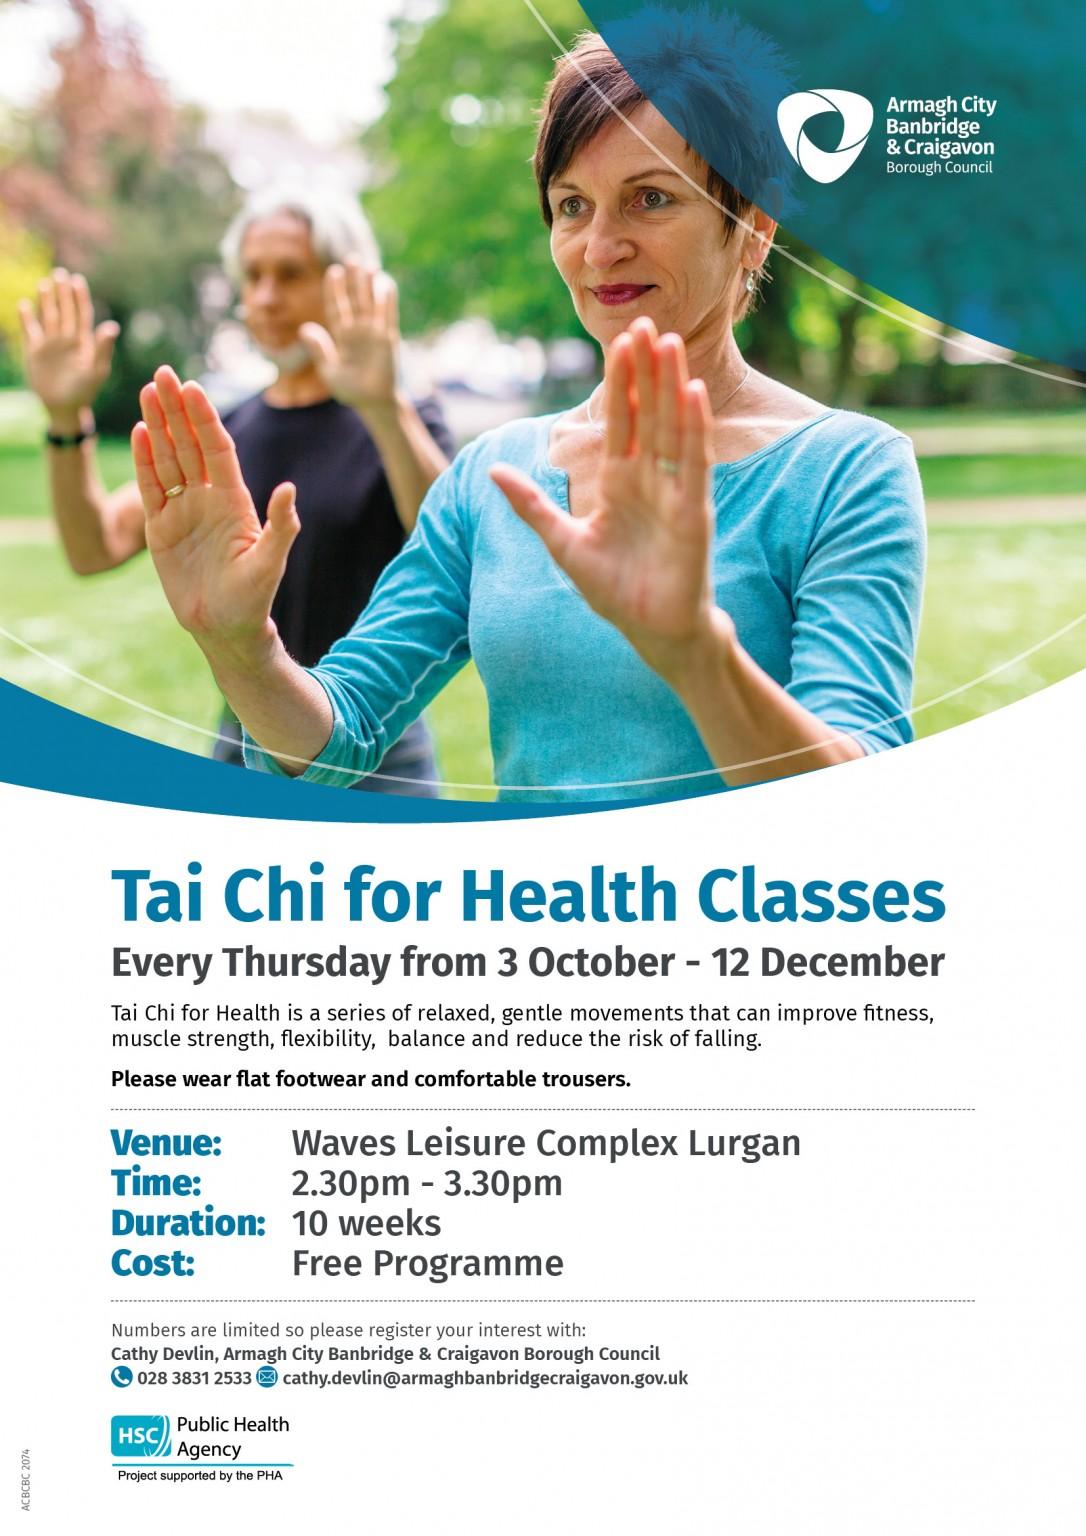 FREE Tai Chi for Health Classes